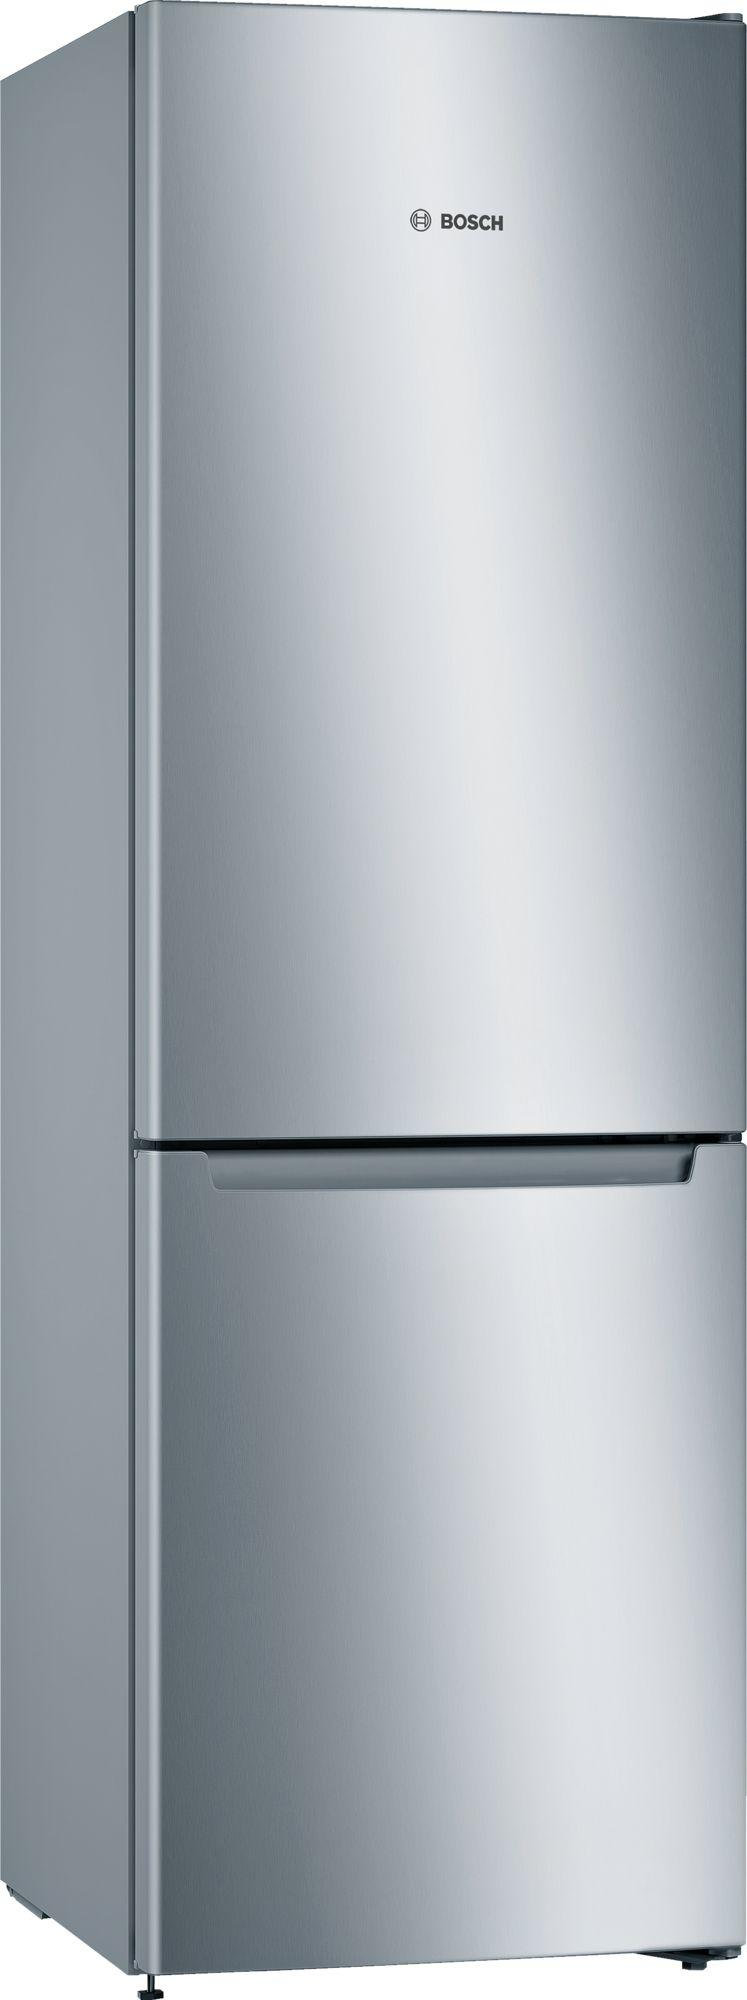 Image of Serie 2 KGN33NLEAG 60cm 279 Litre A++ Frost Free Fridge Freezer | Silver Inox